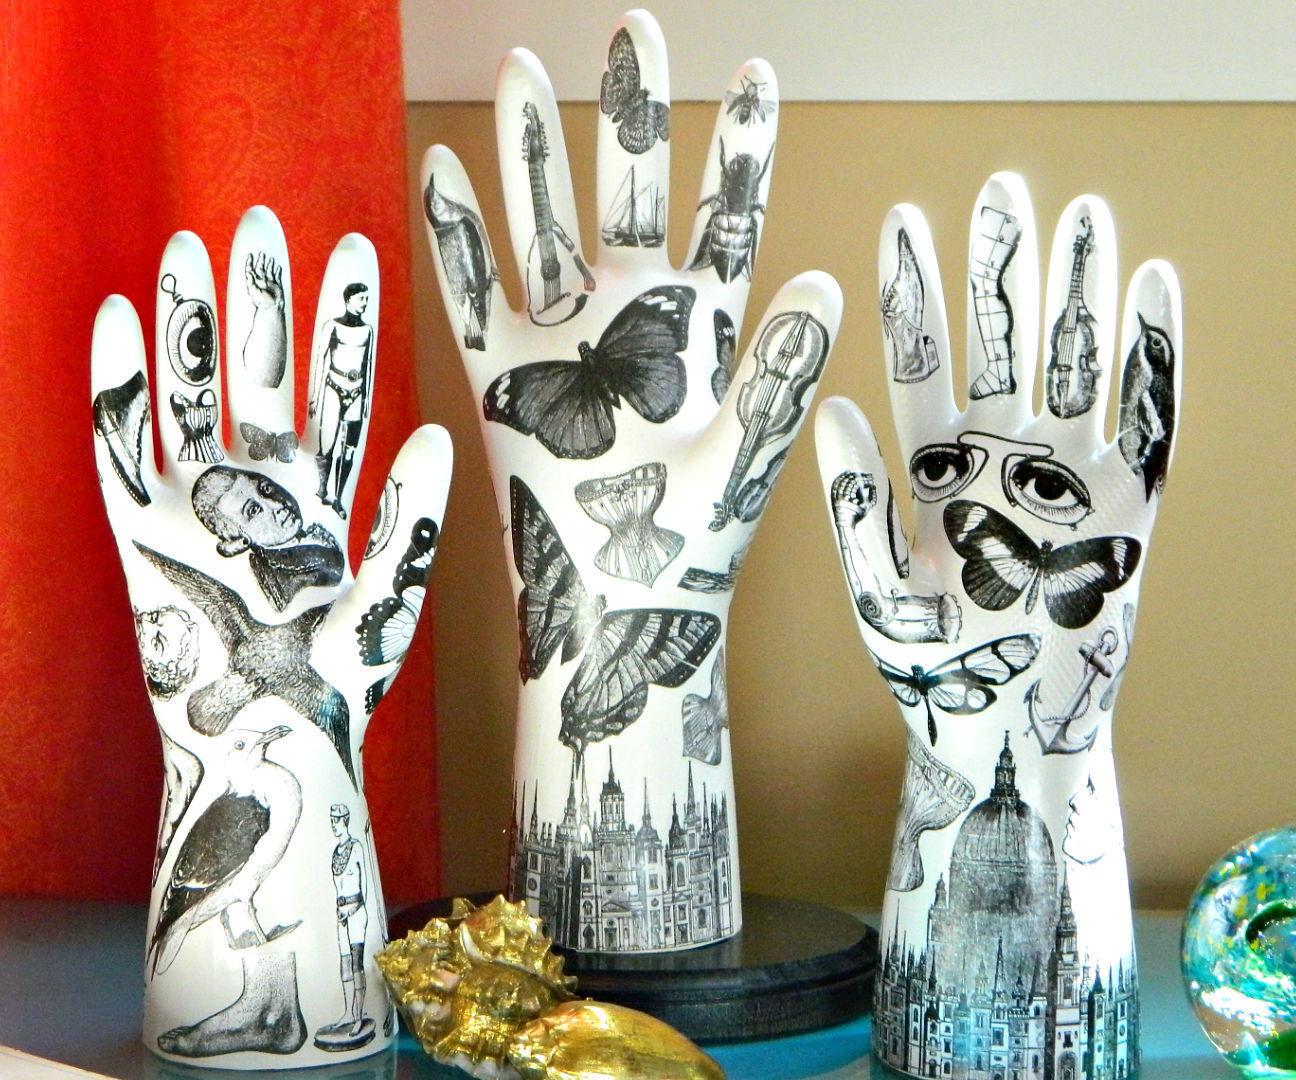 Tattooed Plaster Hands